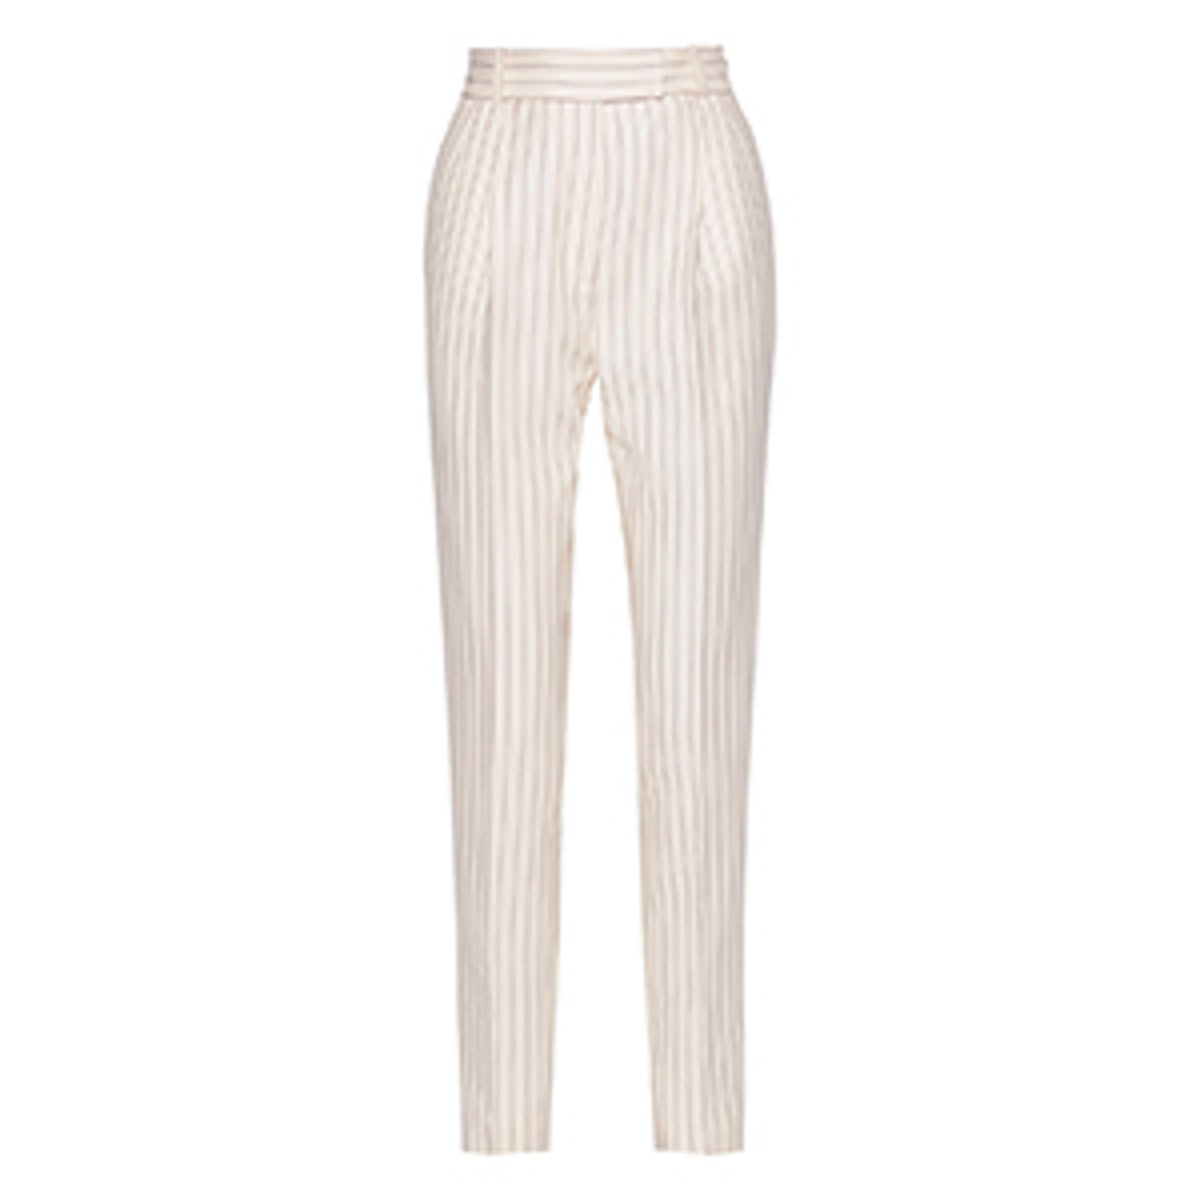 Ariel Pinstriped Grain de Poudre Wool Straight-Leg Pants